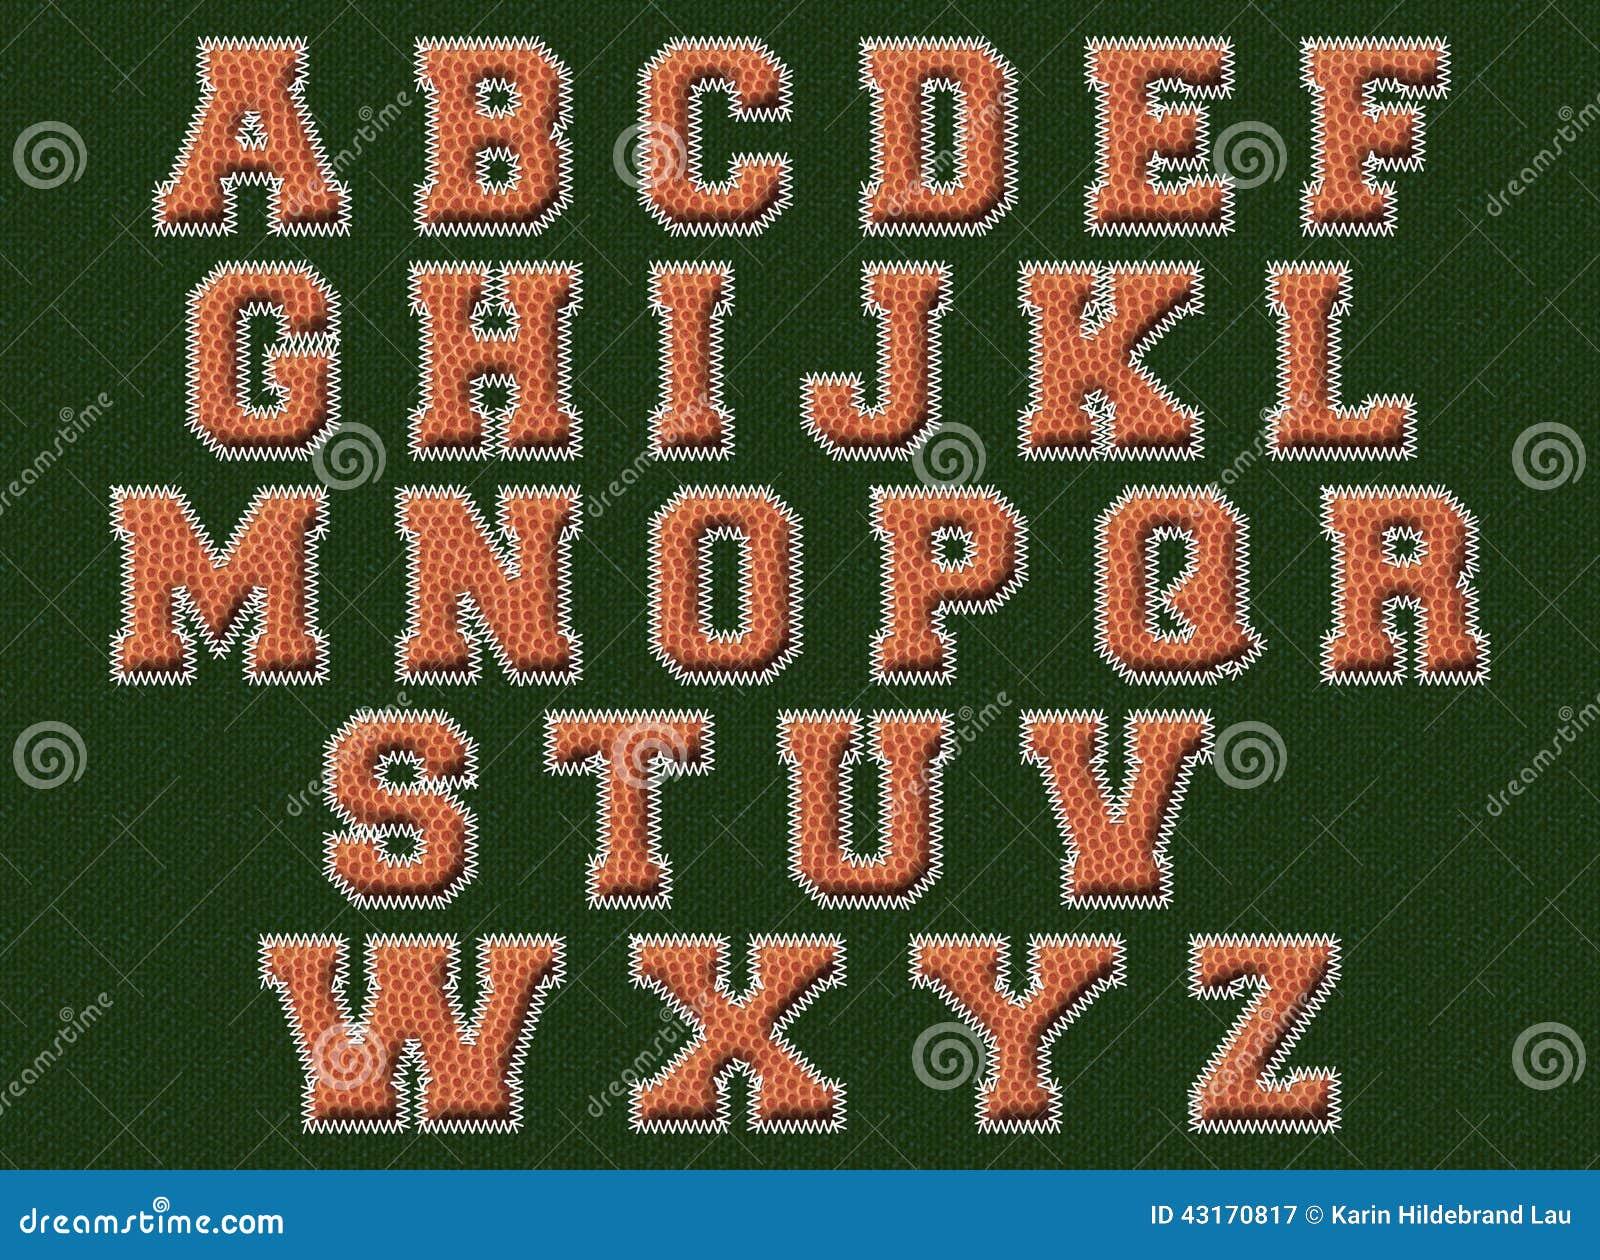 Basketball Font Stock Illustration - Image: 43170817